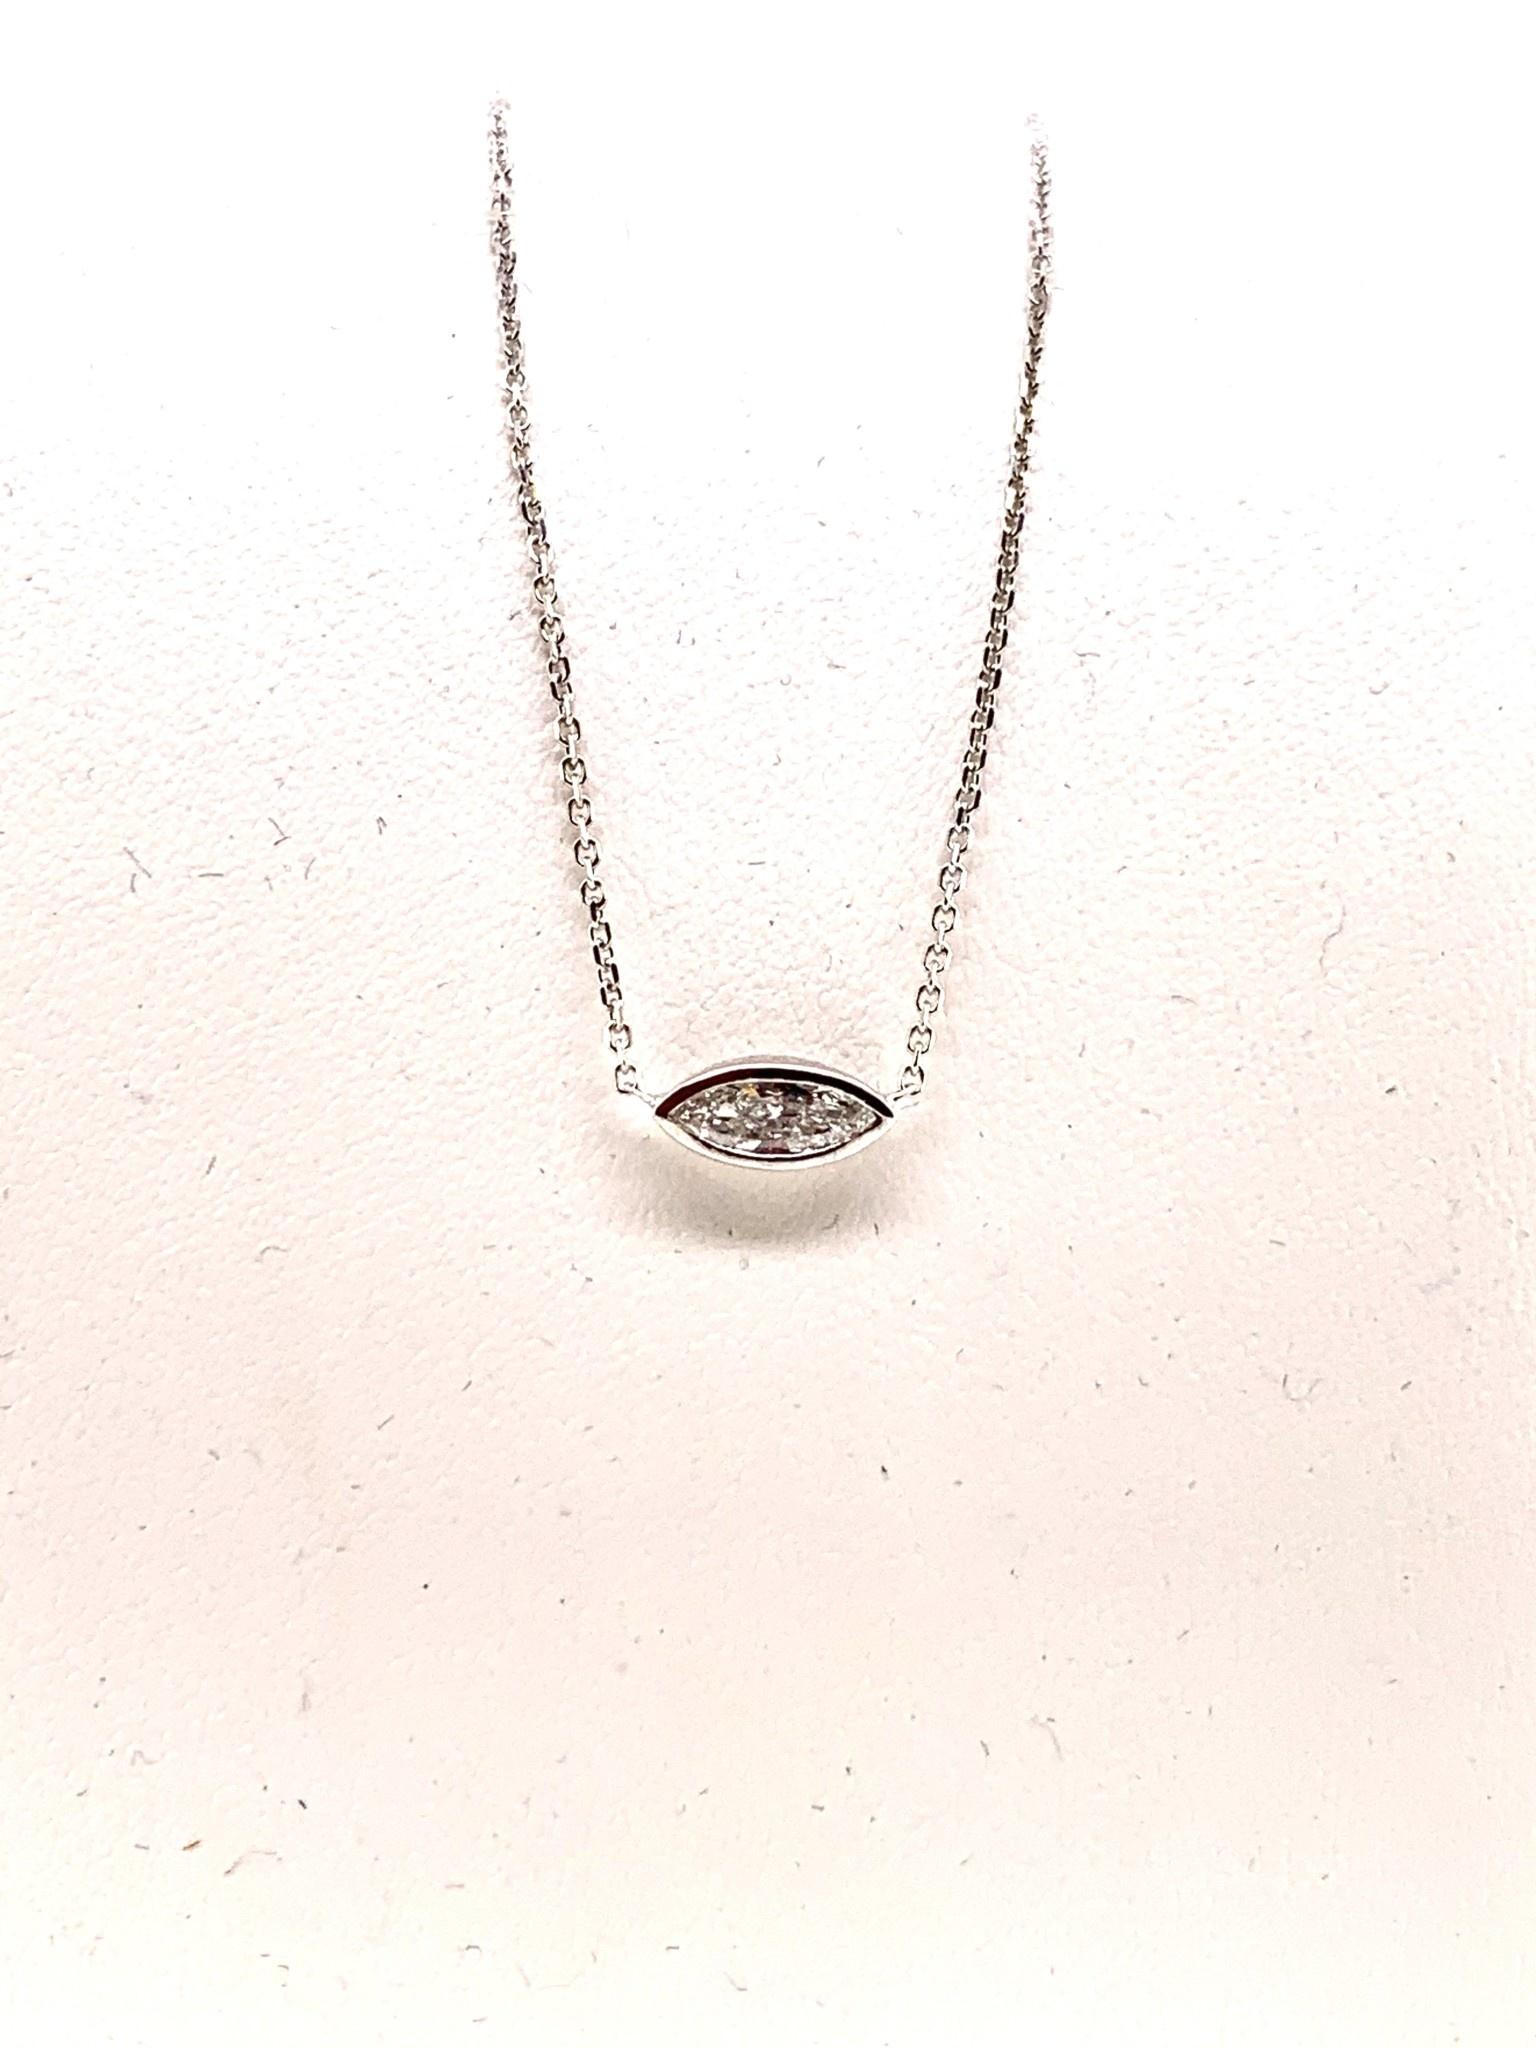 14K white gold east west bezel set 0.27ct marquise diamond necklace